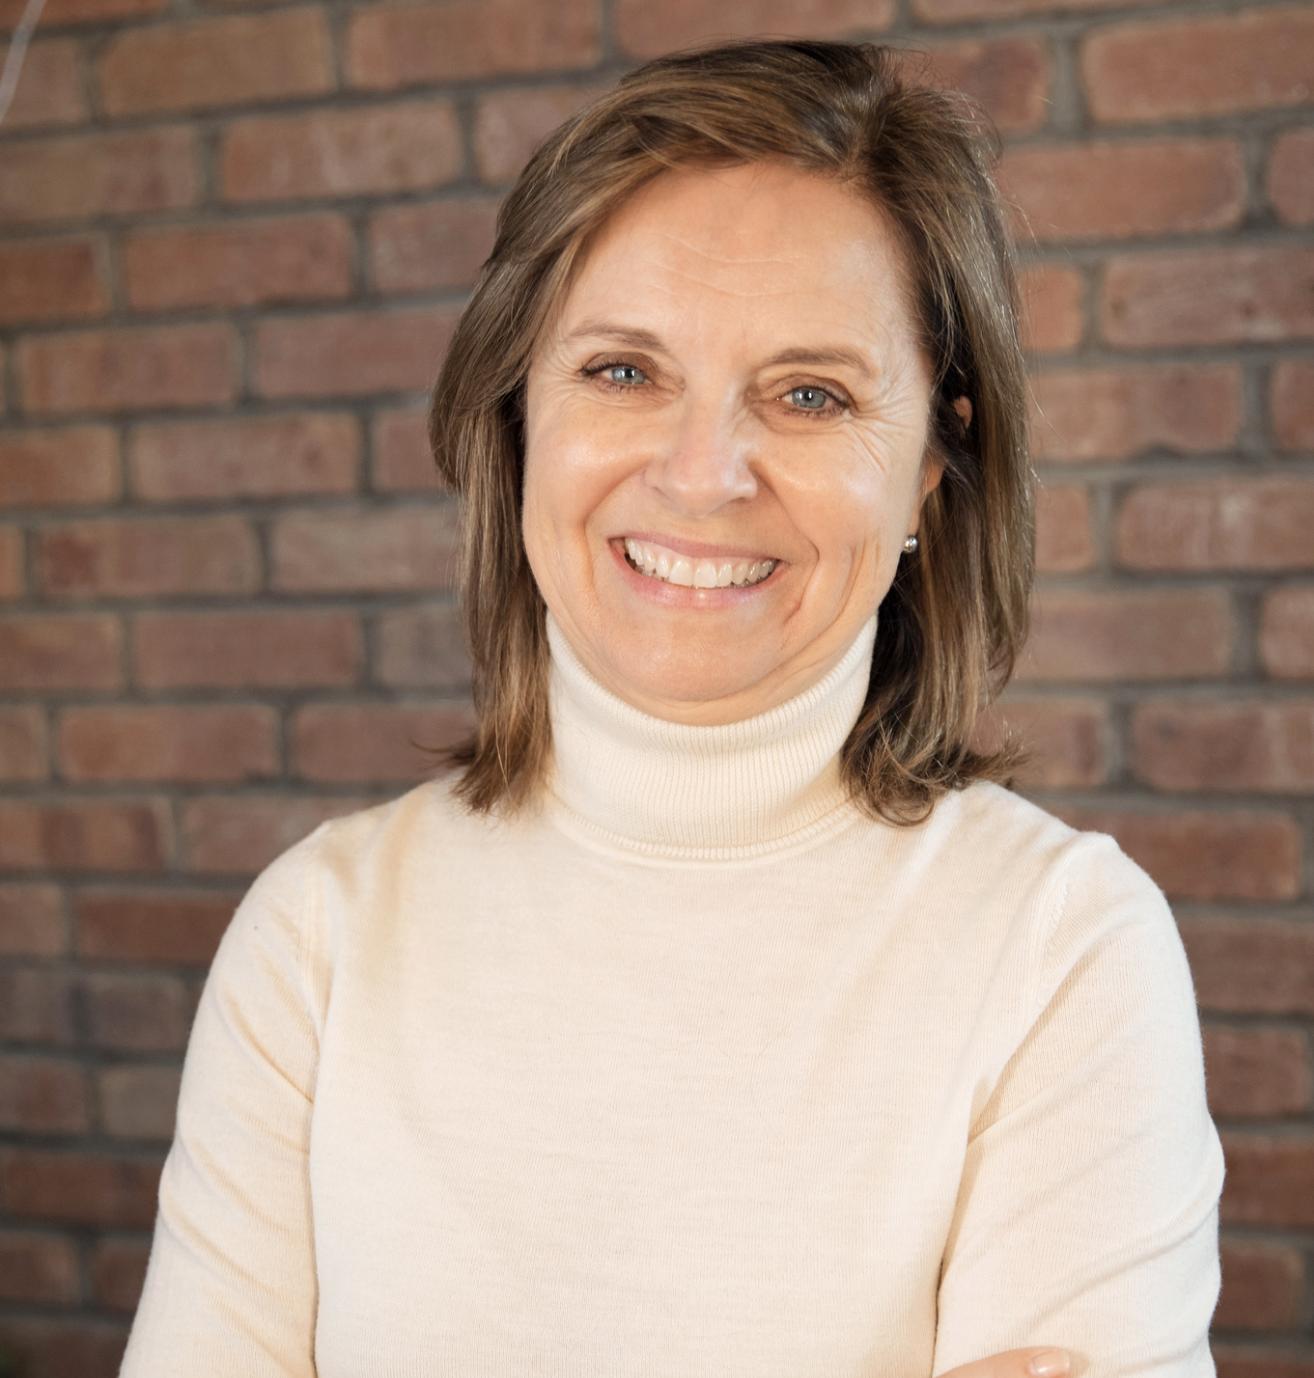 Director Cynthia Malinick